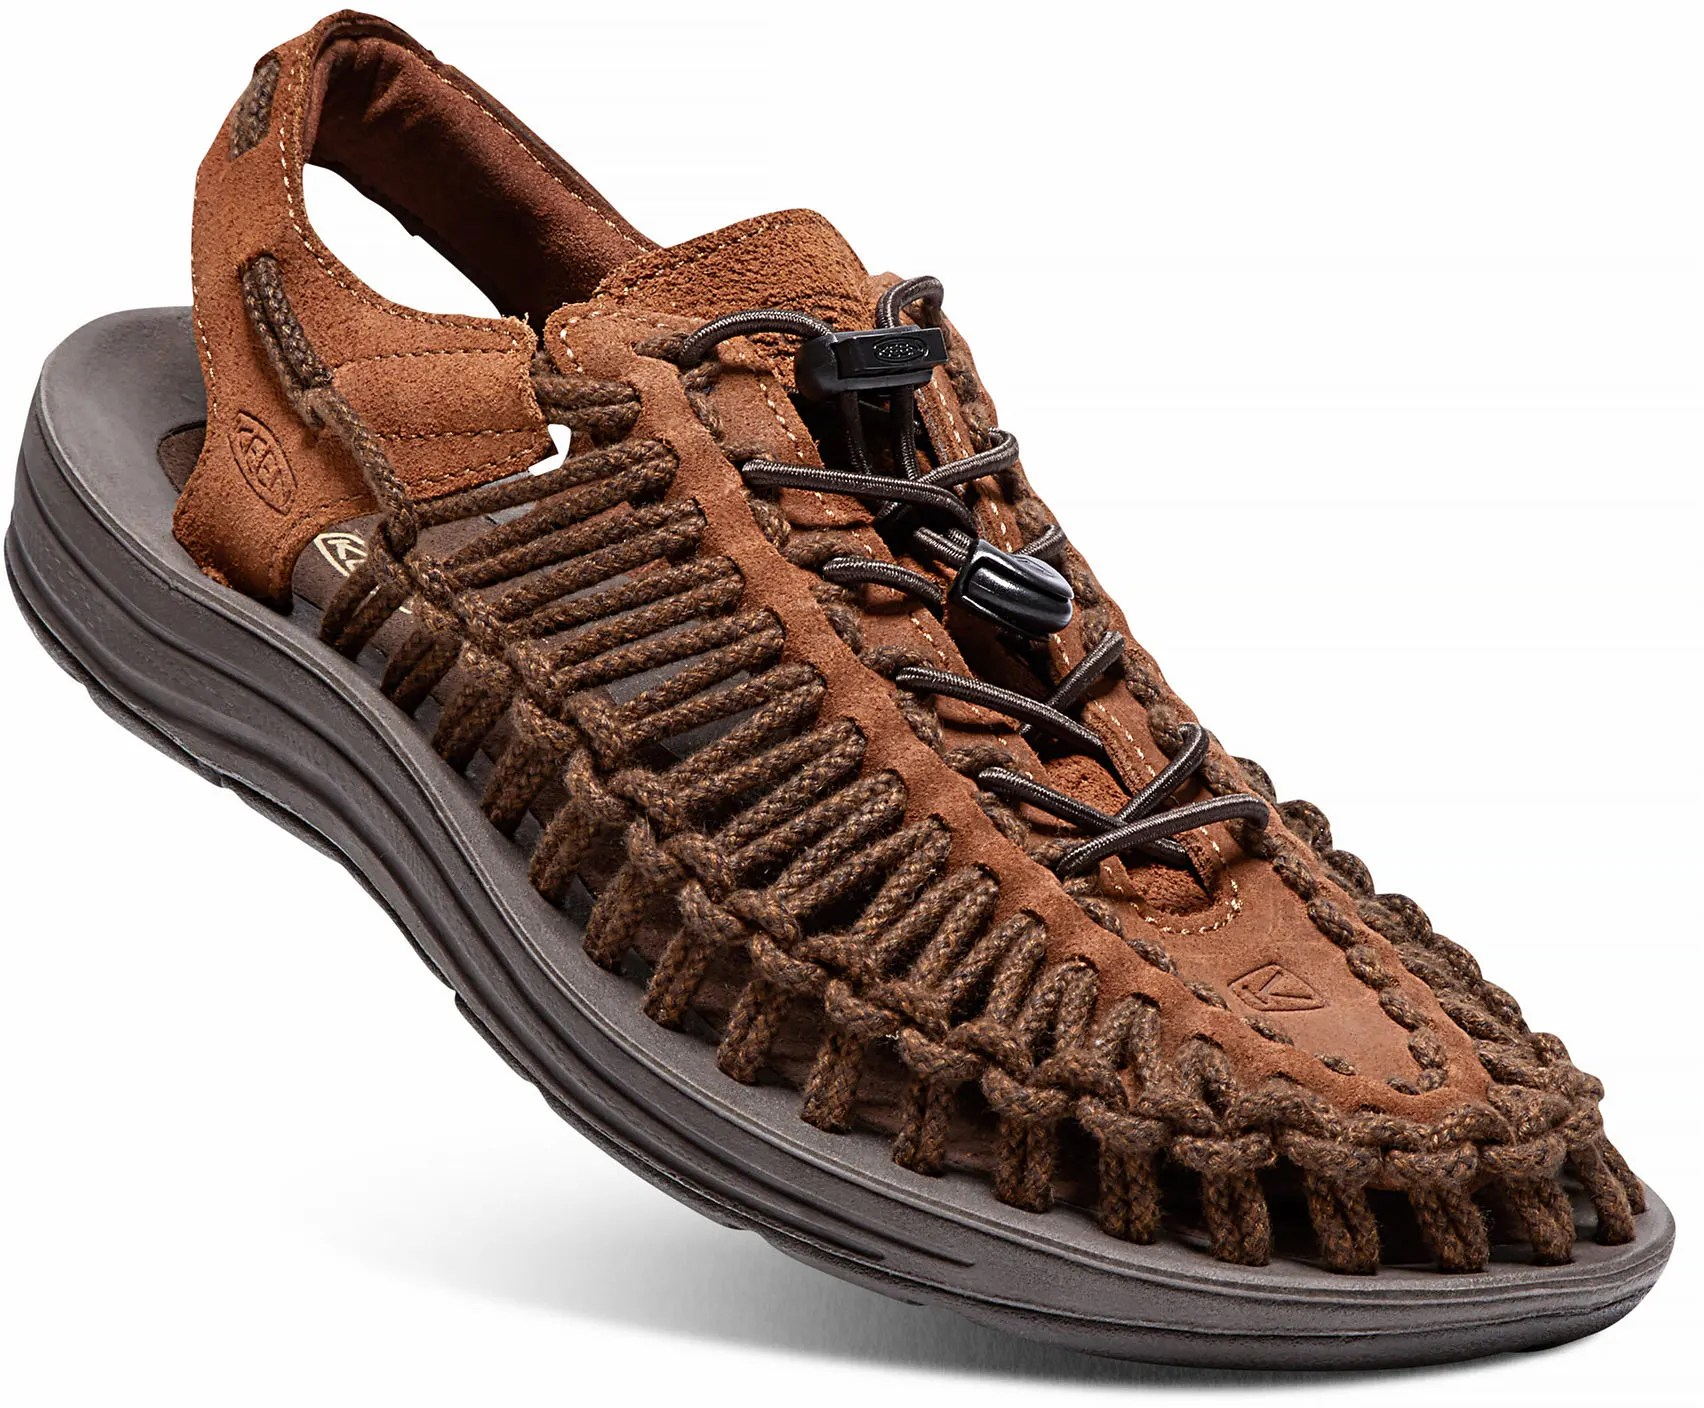 Keen Shoes Kids